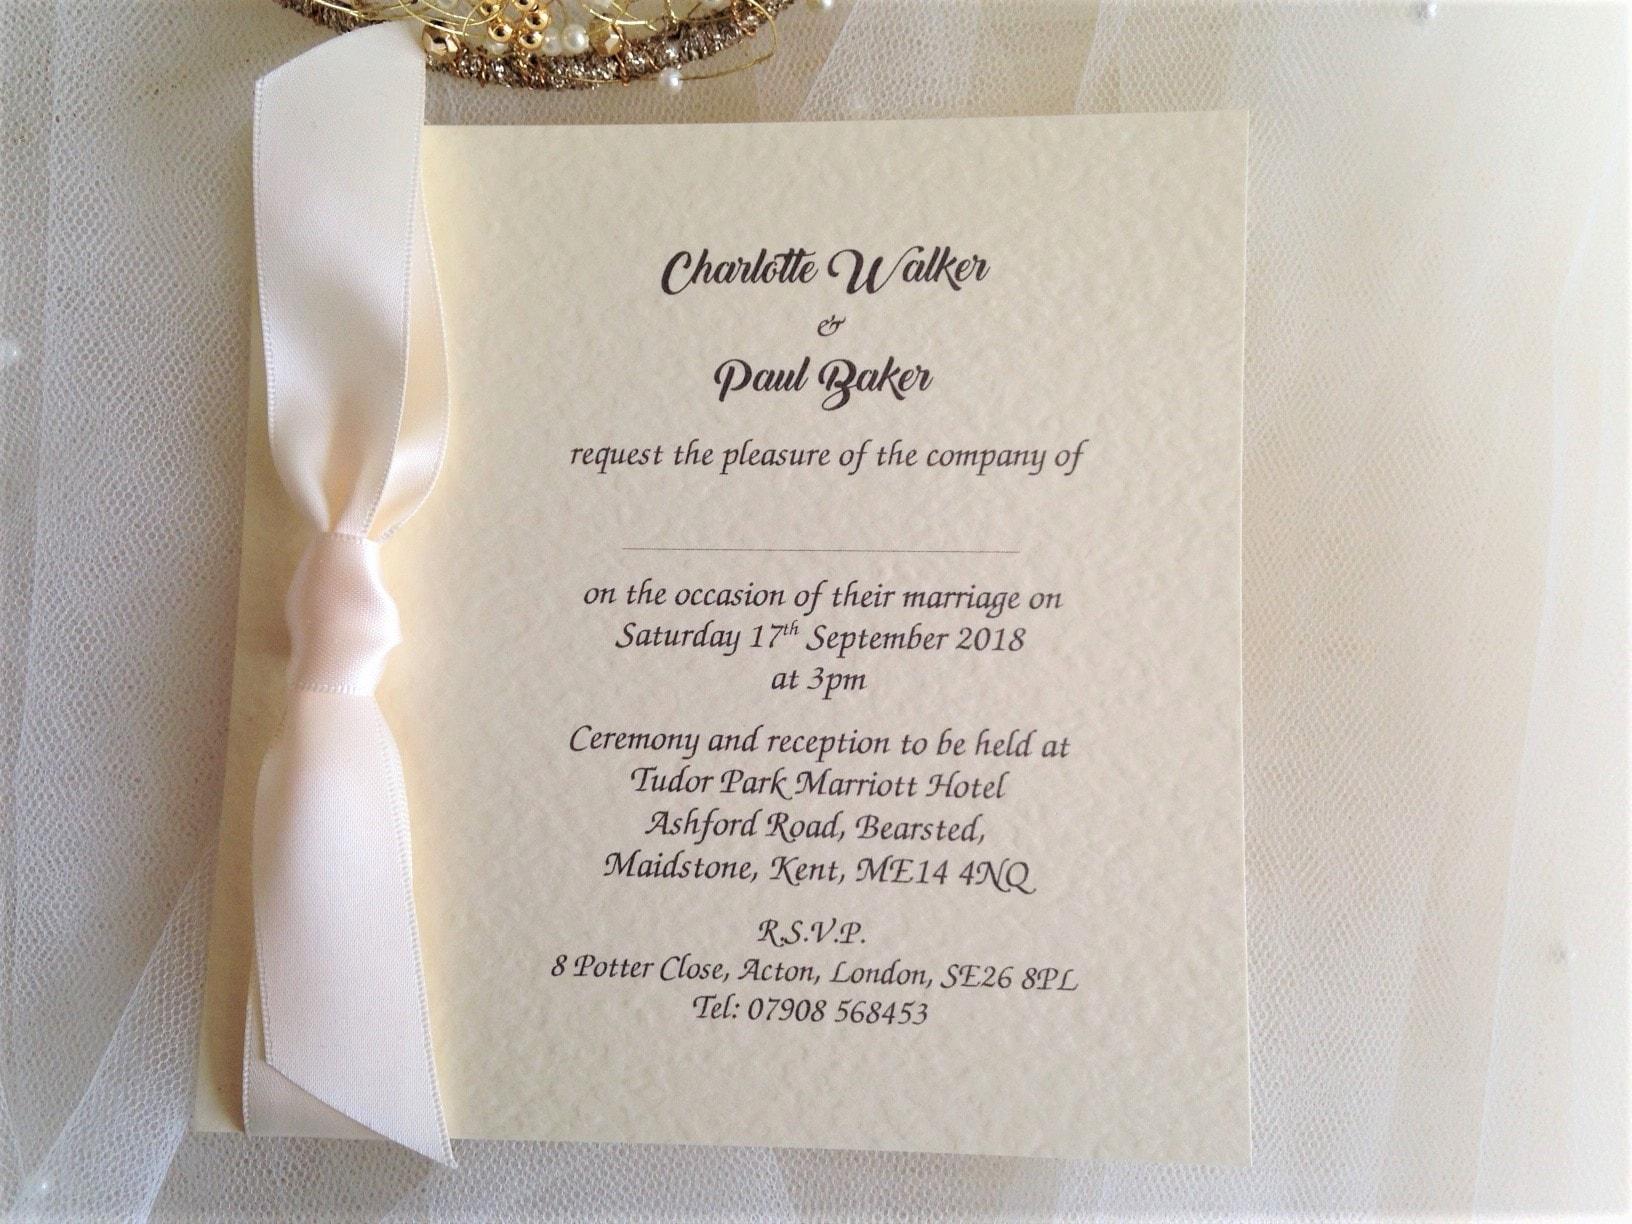 Ivory Wedding Invitations: Ivory Wedding Invites 85p